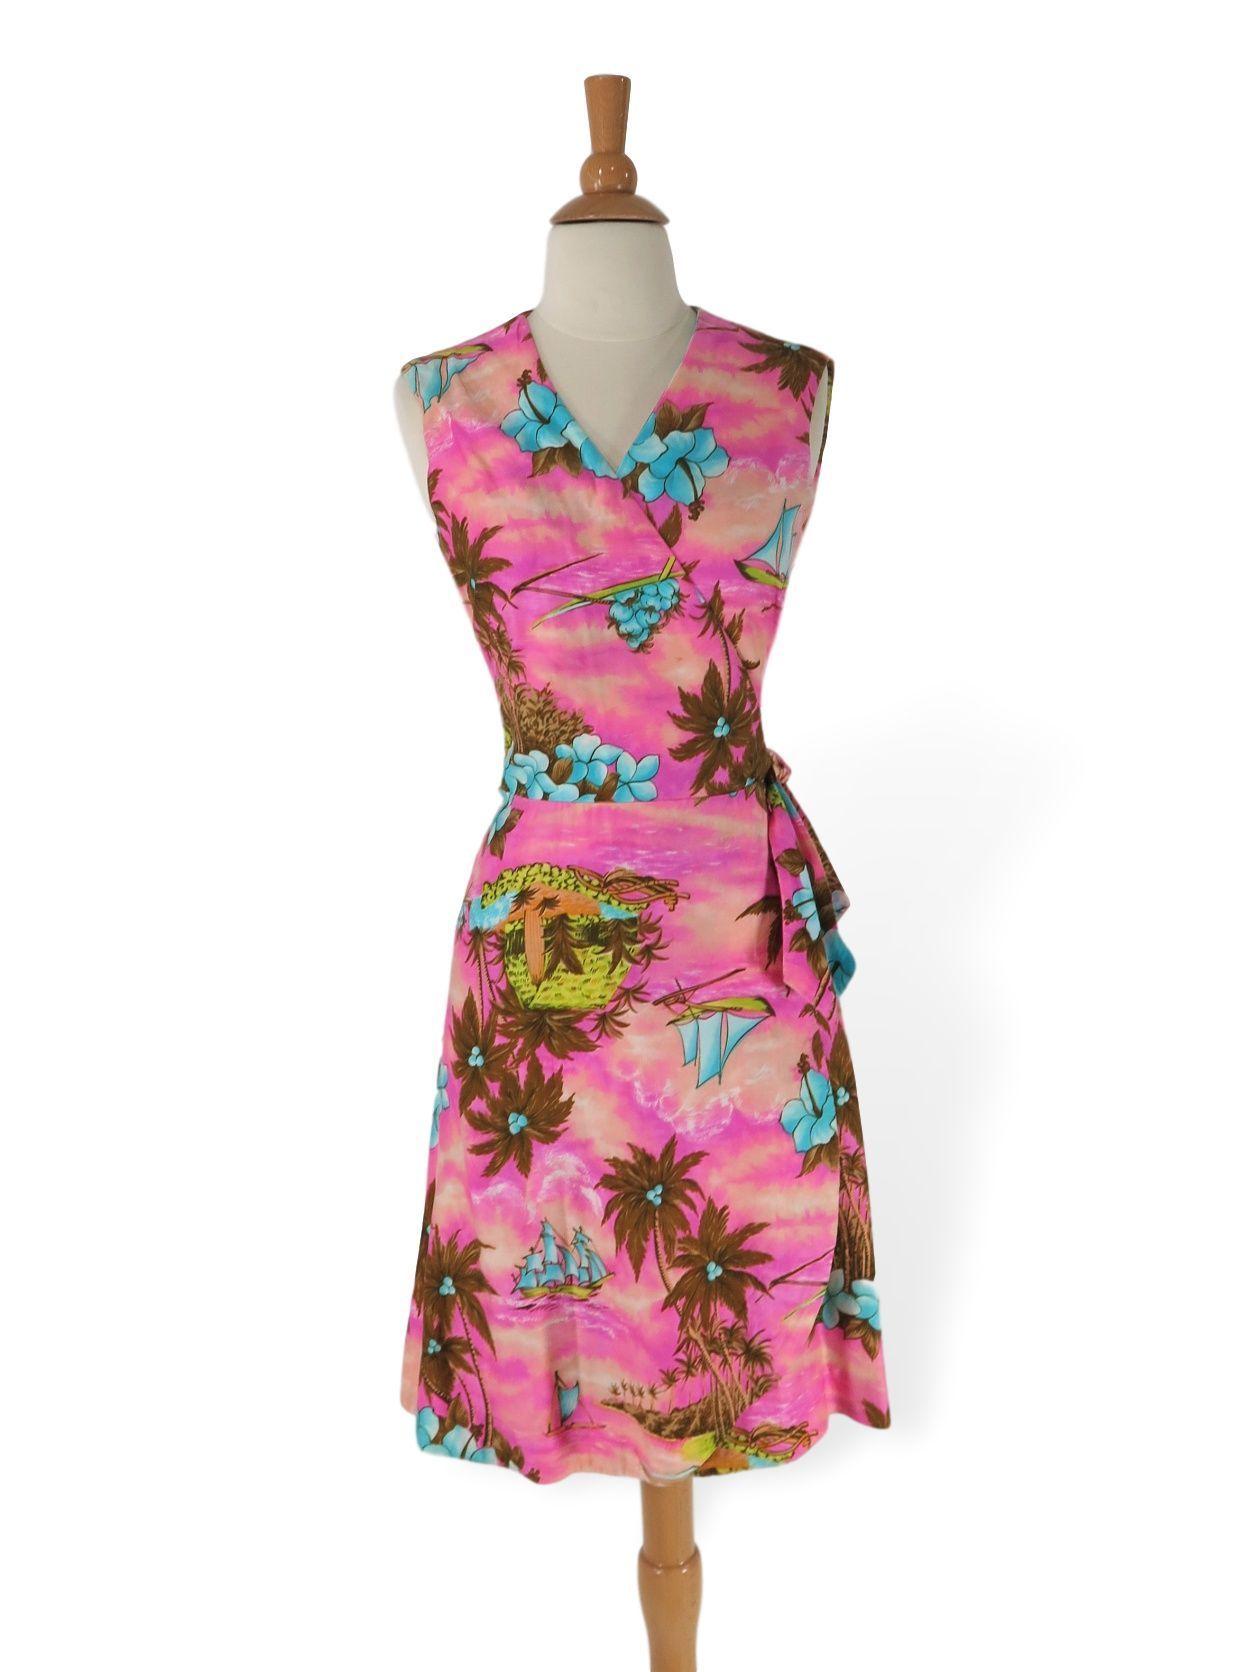 60s 70s Hawaiian Sarong Wrap Dress In 2021 Wrap Dress Dresses Vintage Dresses [ 1672 x 1254 Pixel ]